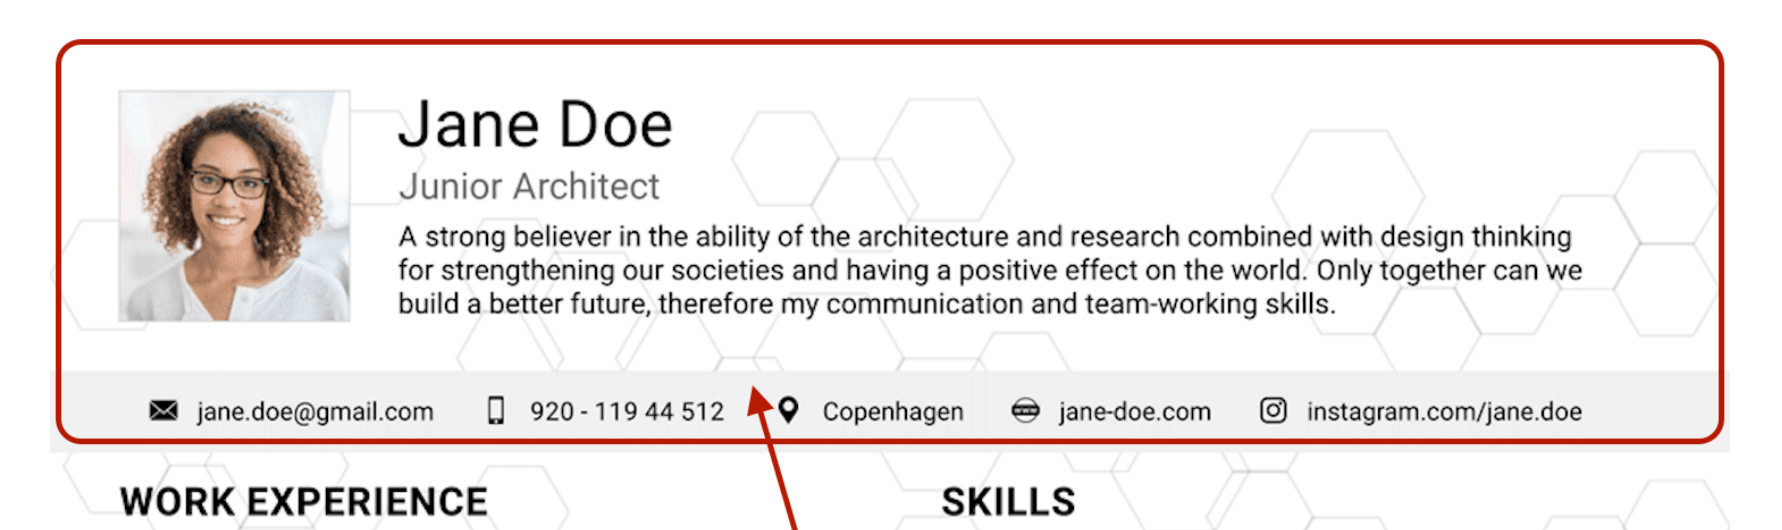 resume header example